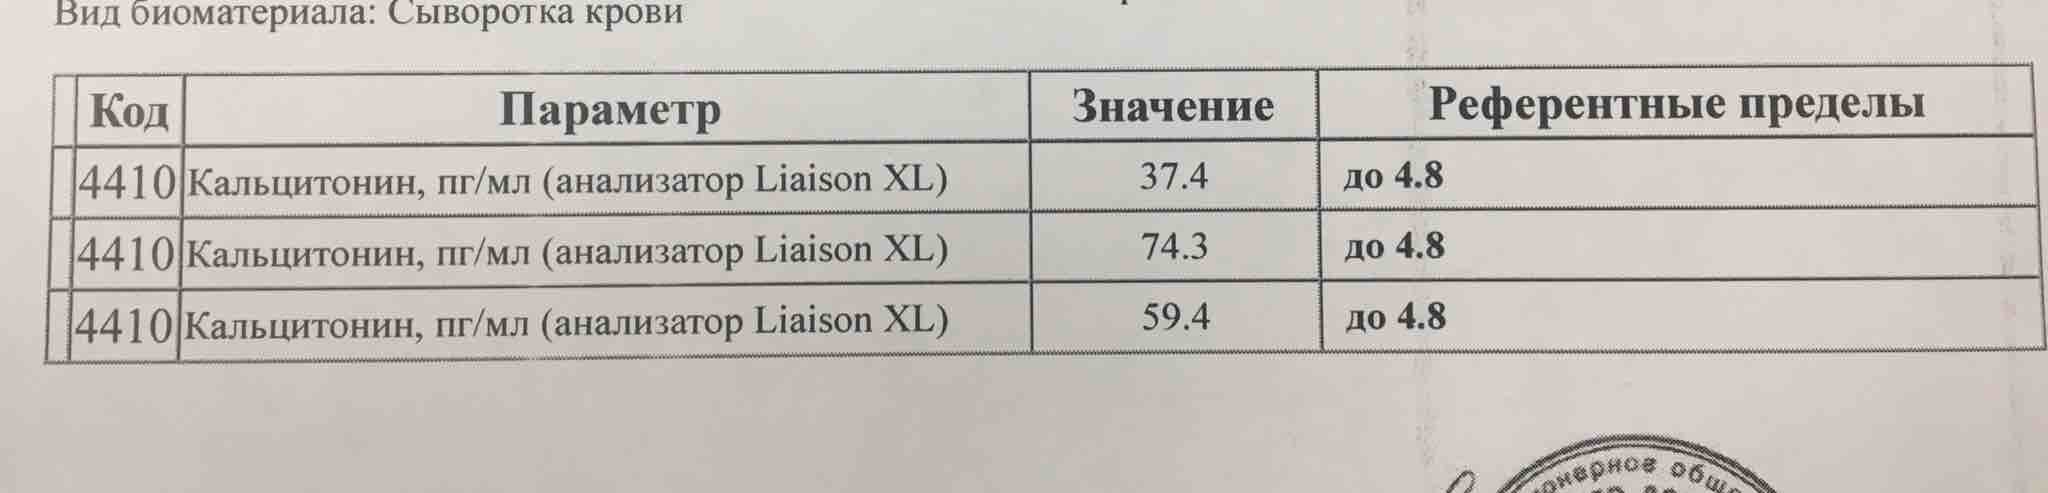 кальцитонин норма анализа